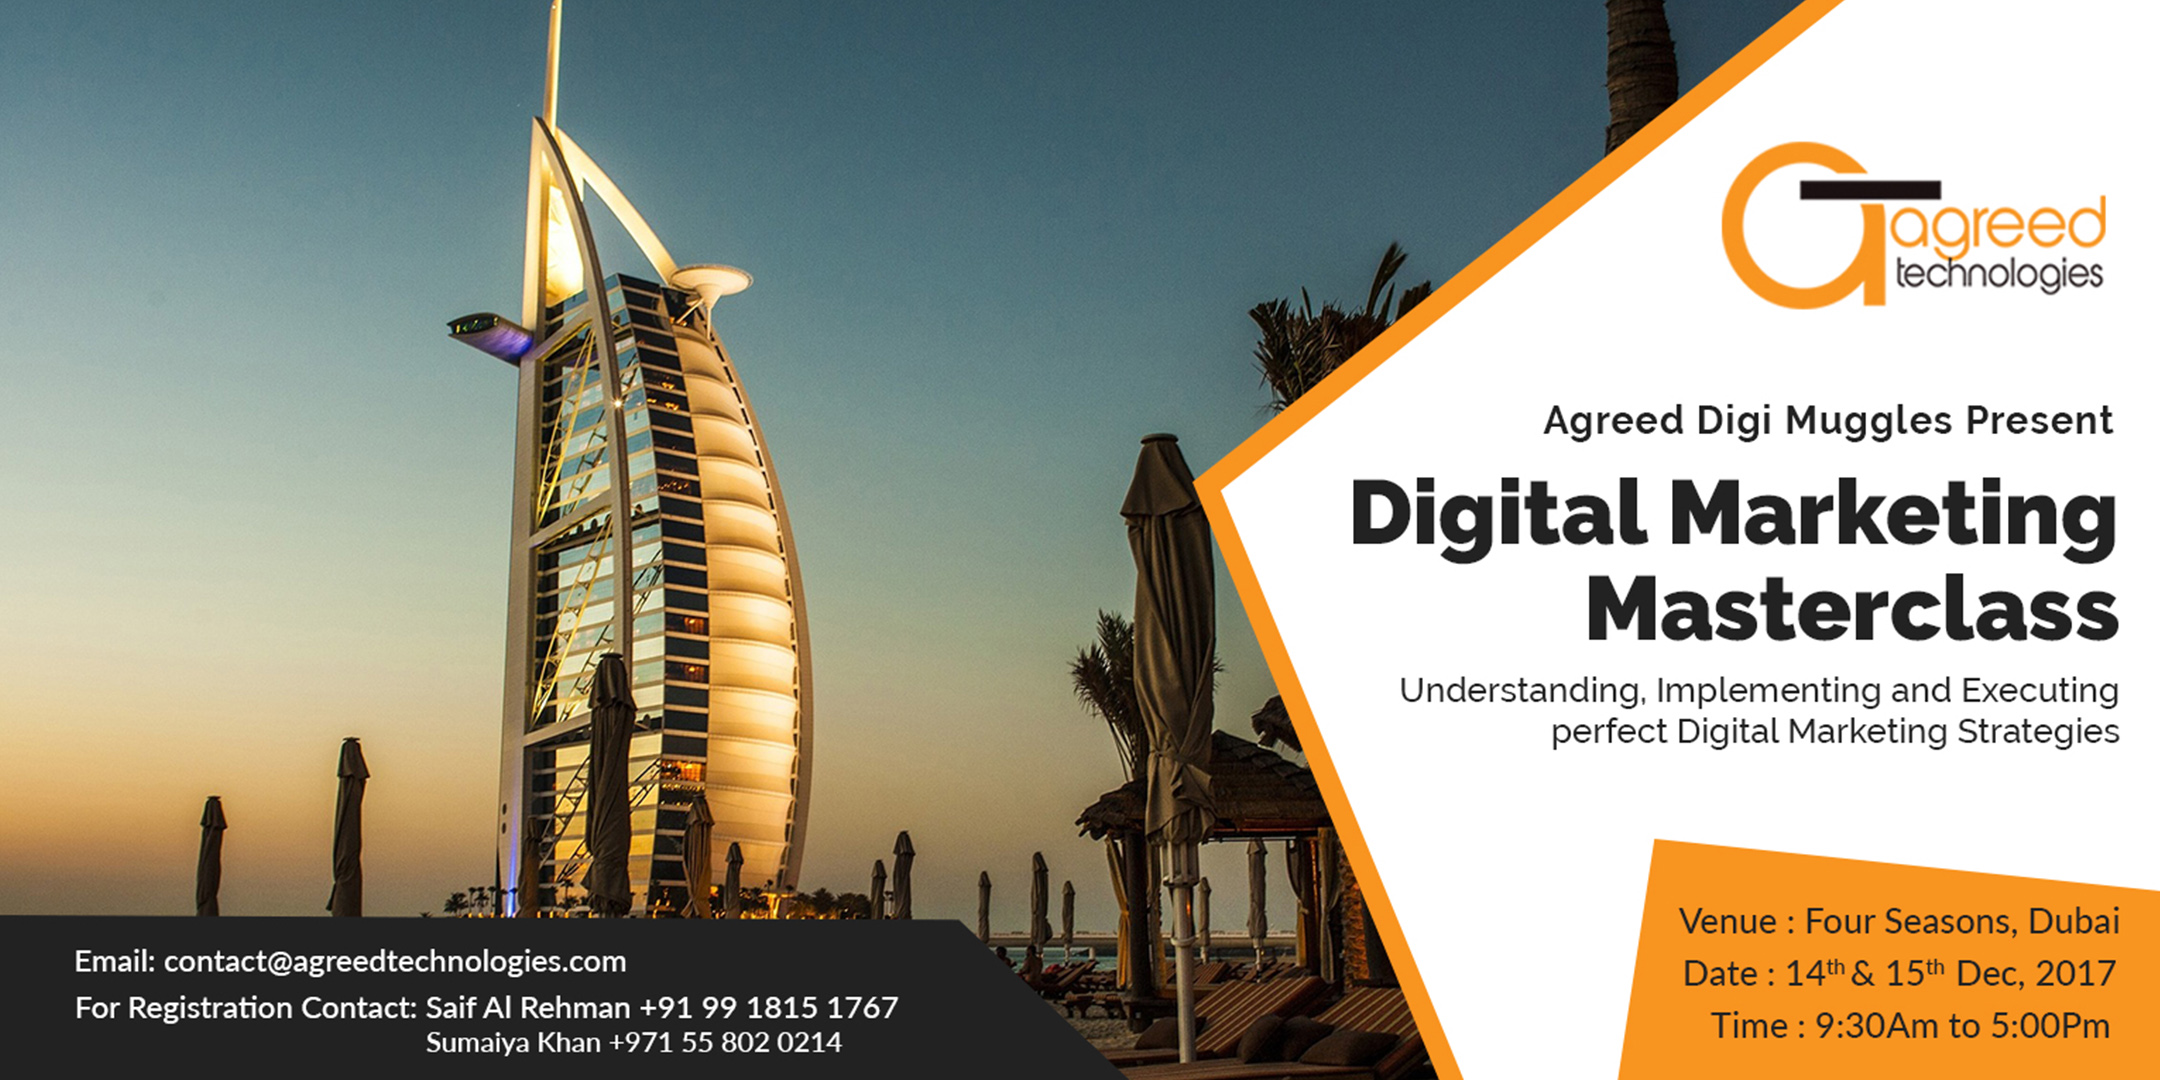 Digital Marketing Masterclass (14th & 15th Dec), Dubai